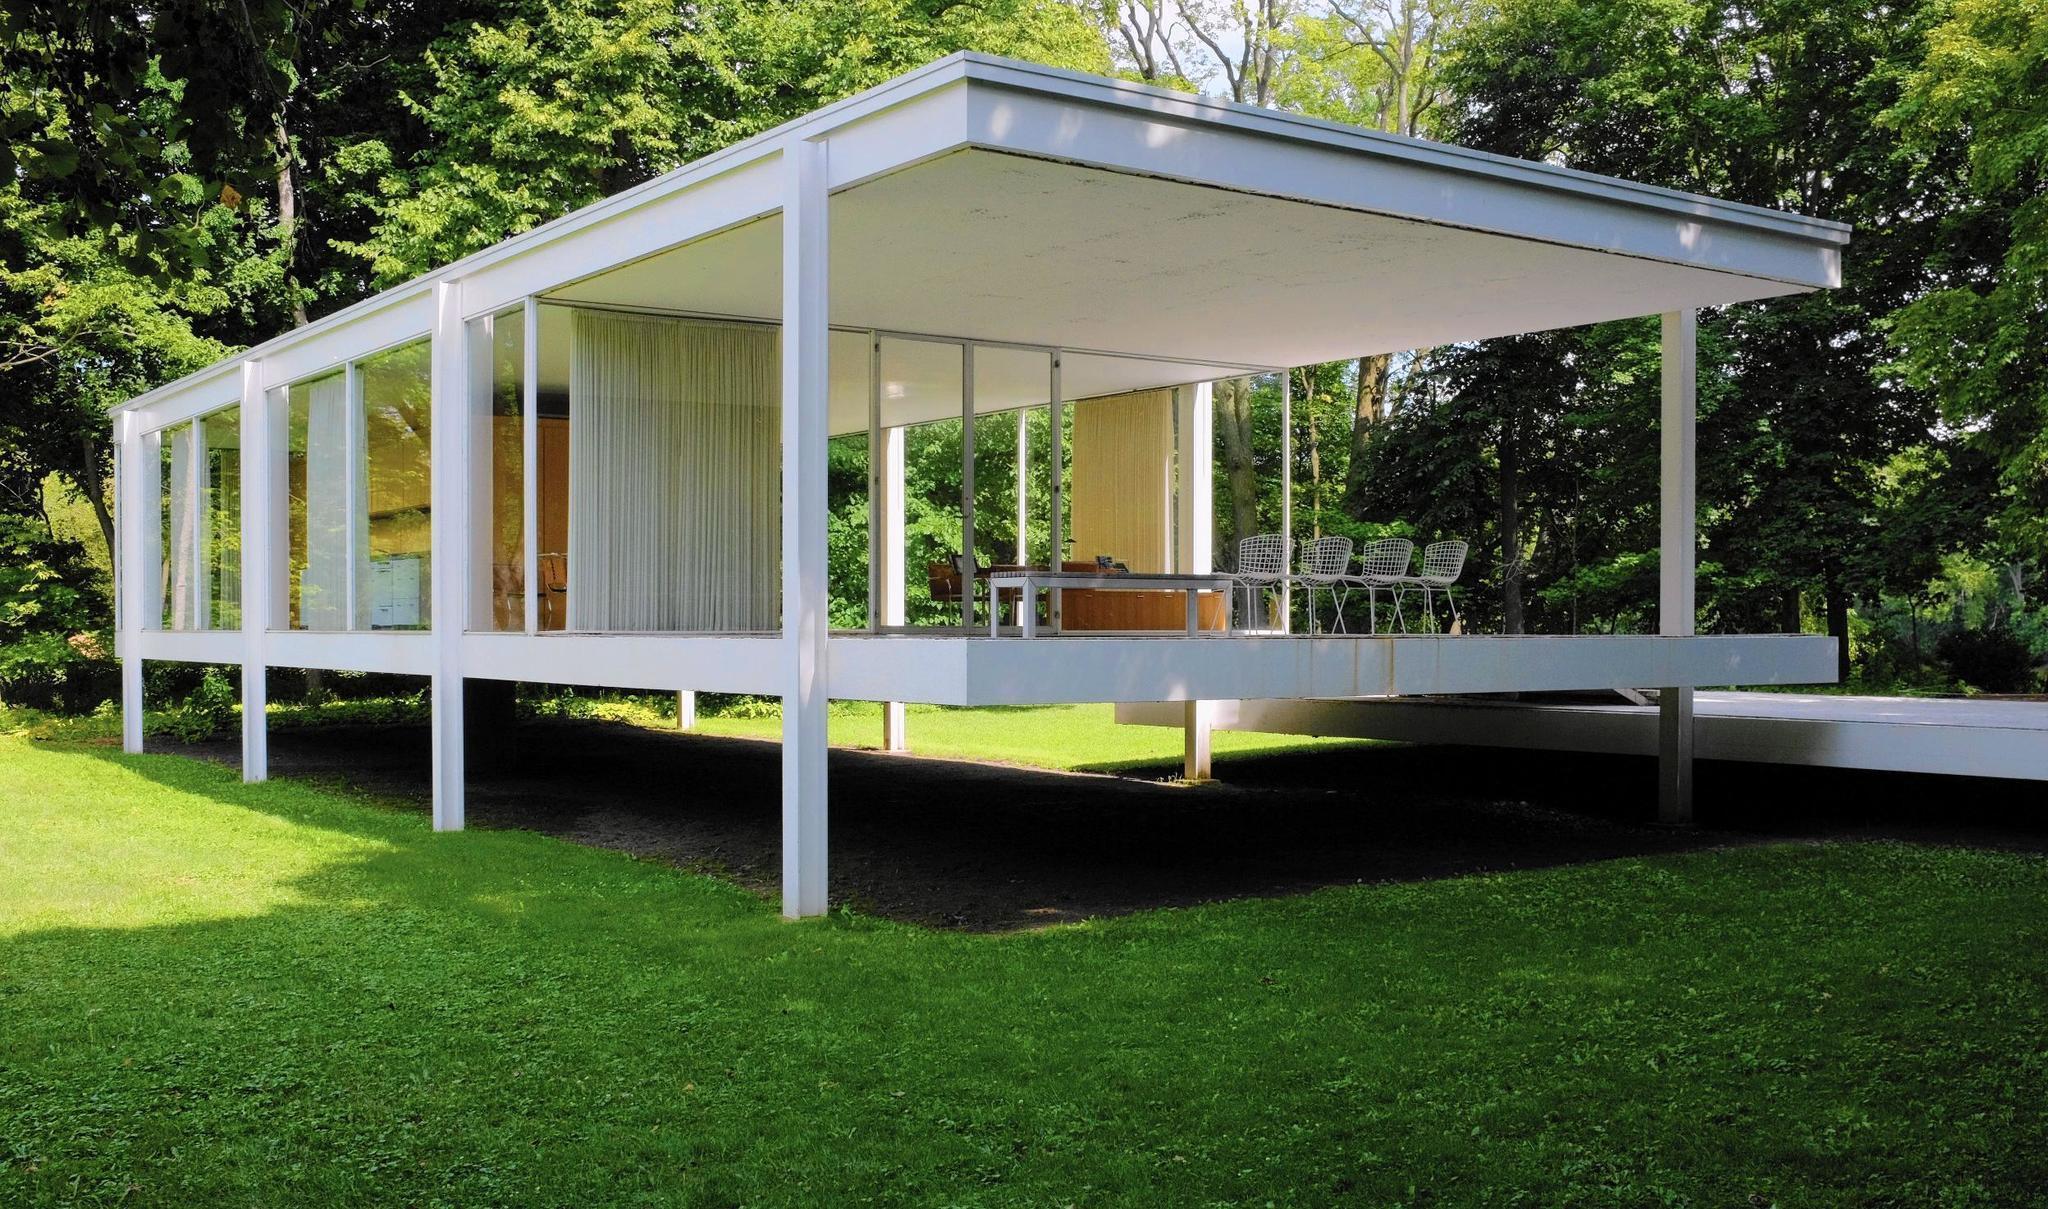 ct-farnsworth-house-met-kamin-0525-20170524.jpg